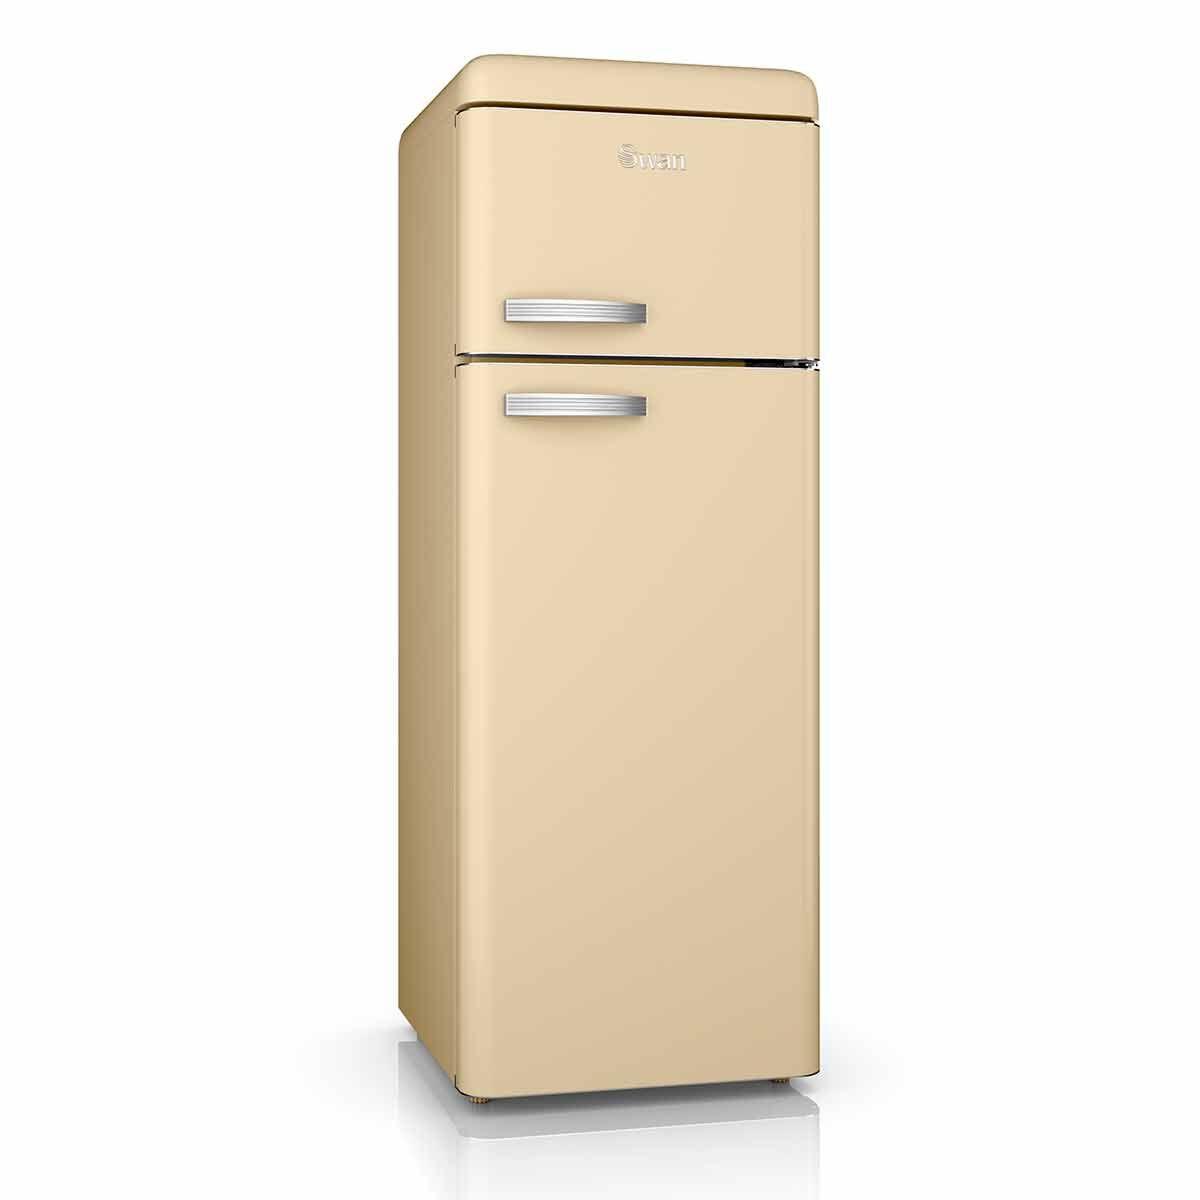 Swan Retro Fridge Freezer 208L